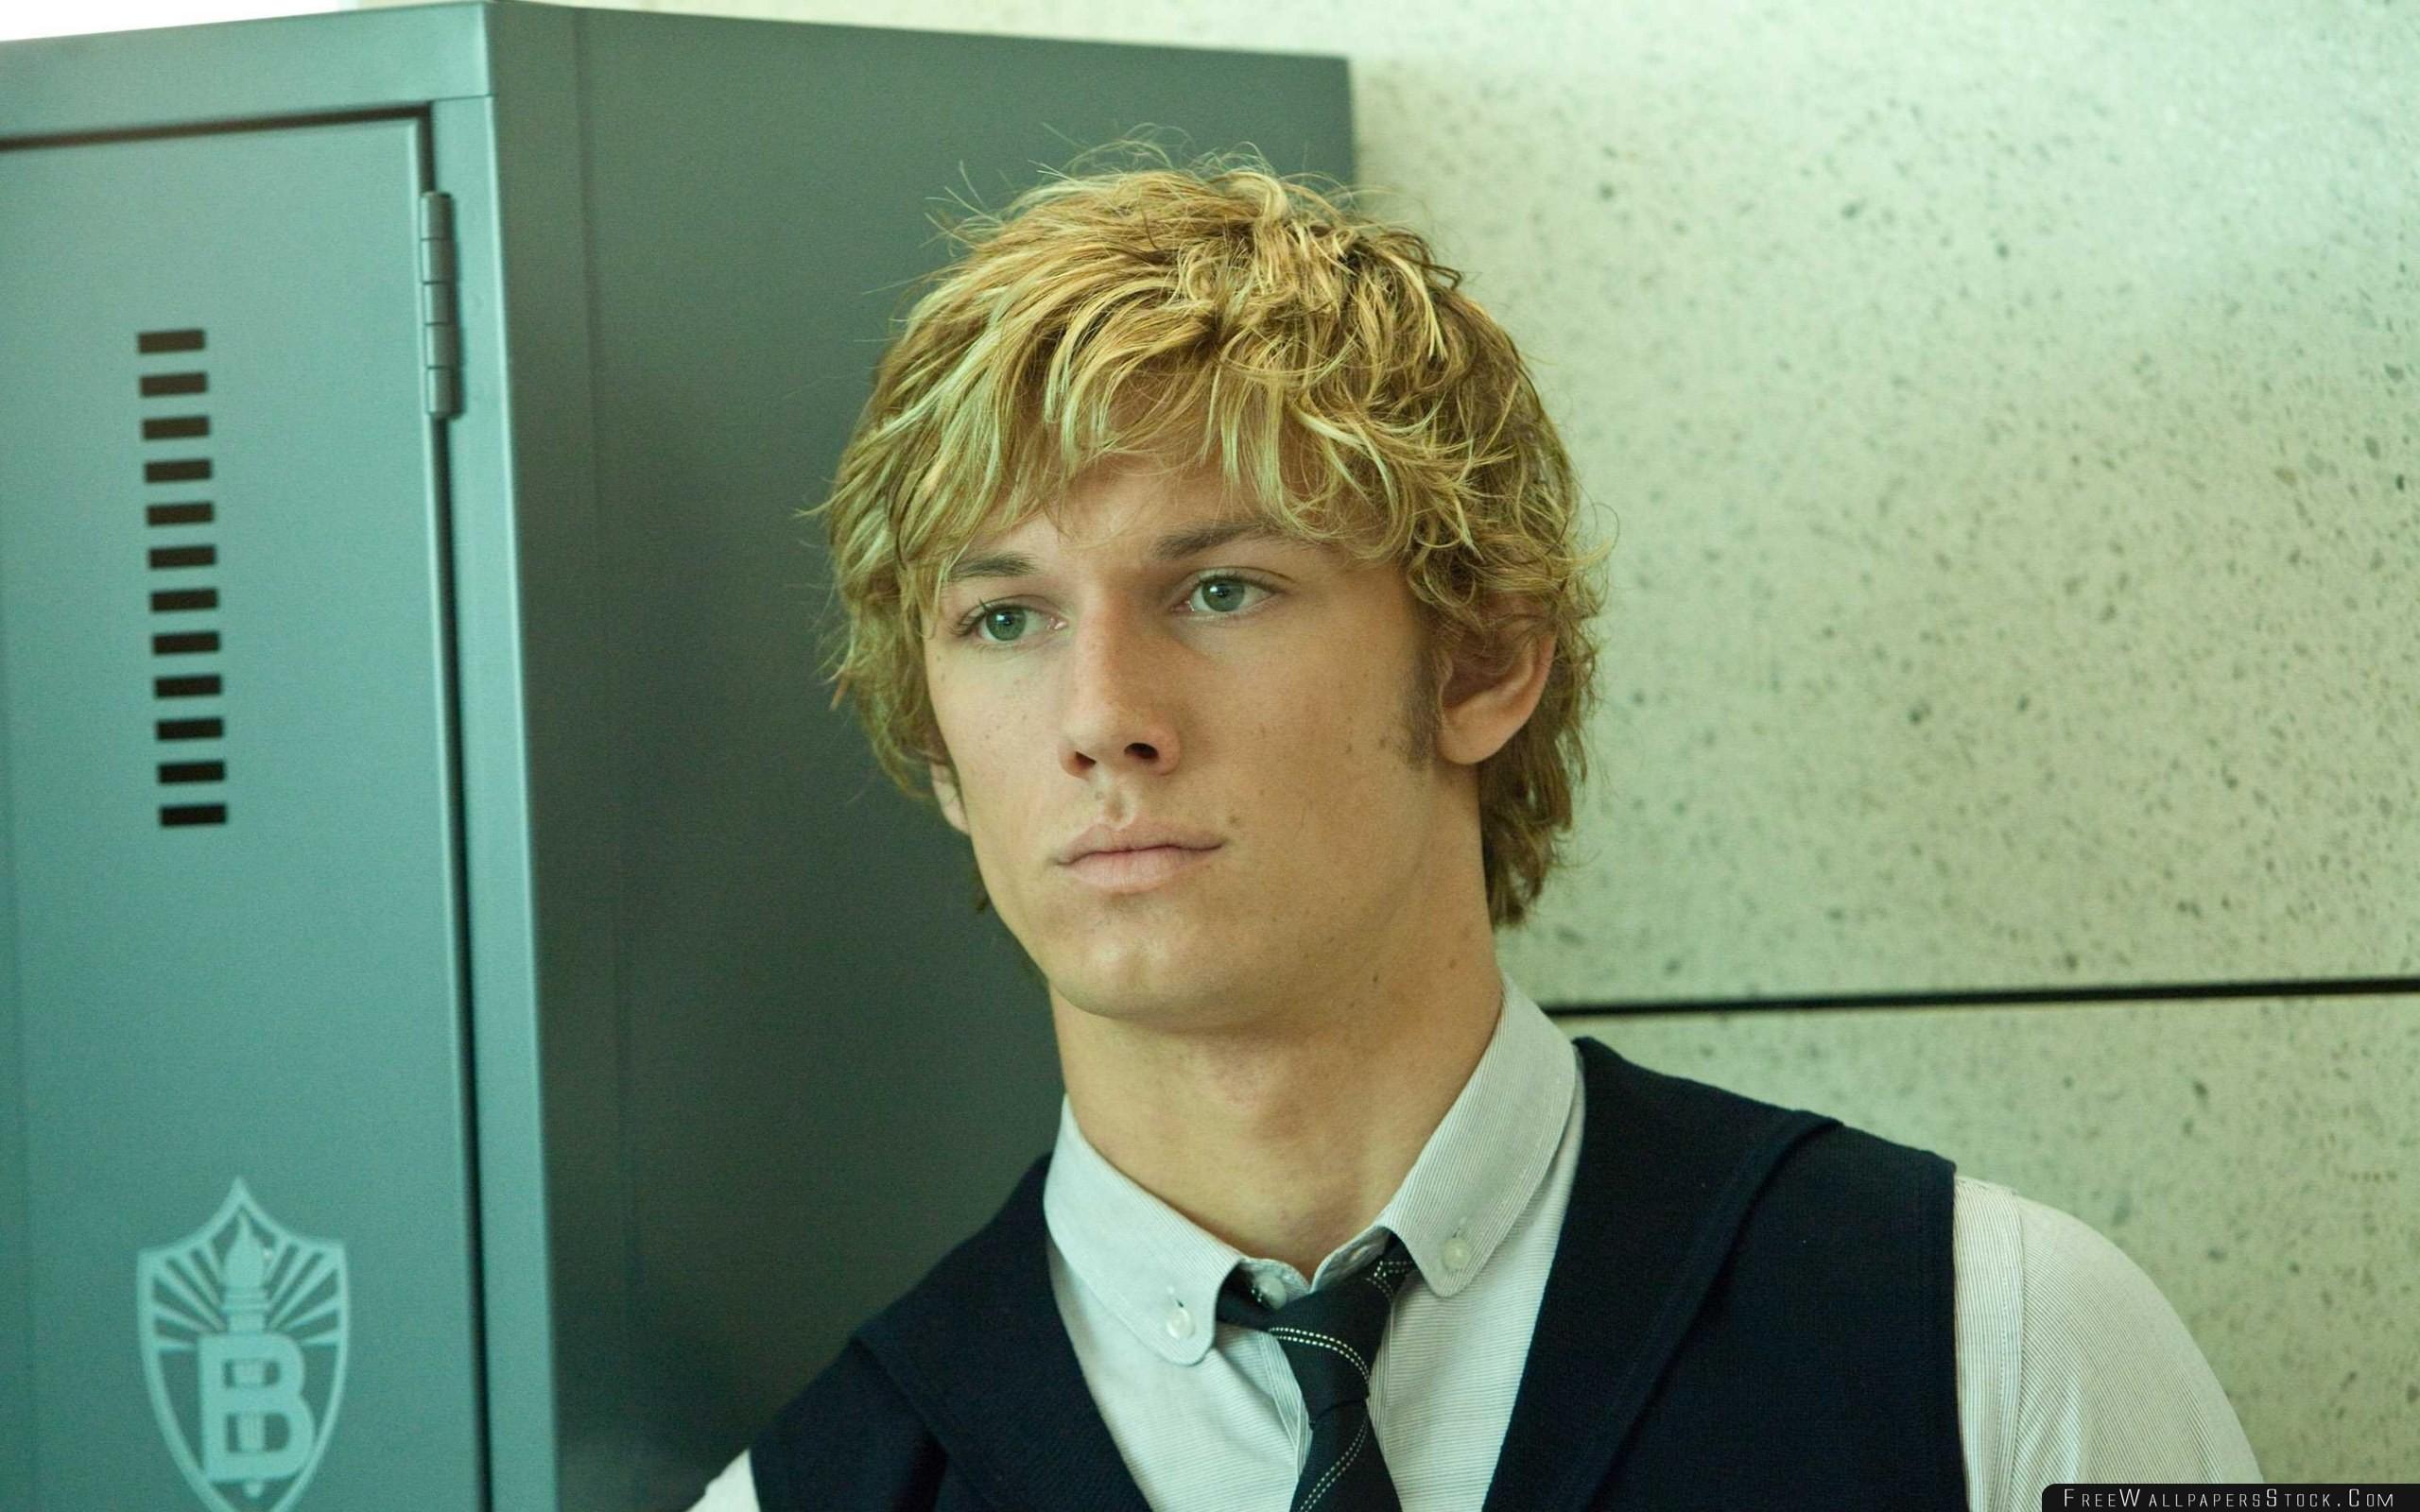 Download Free Wallpaper Alex Pettyfer Blond Actor Guy Cute